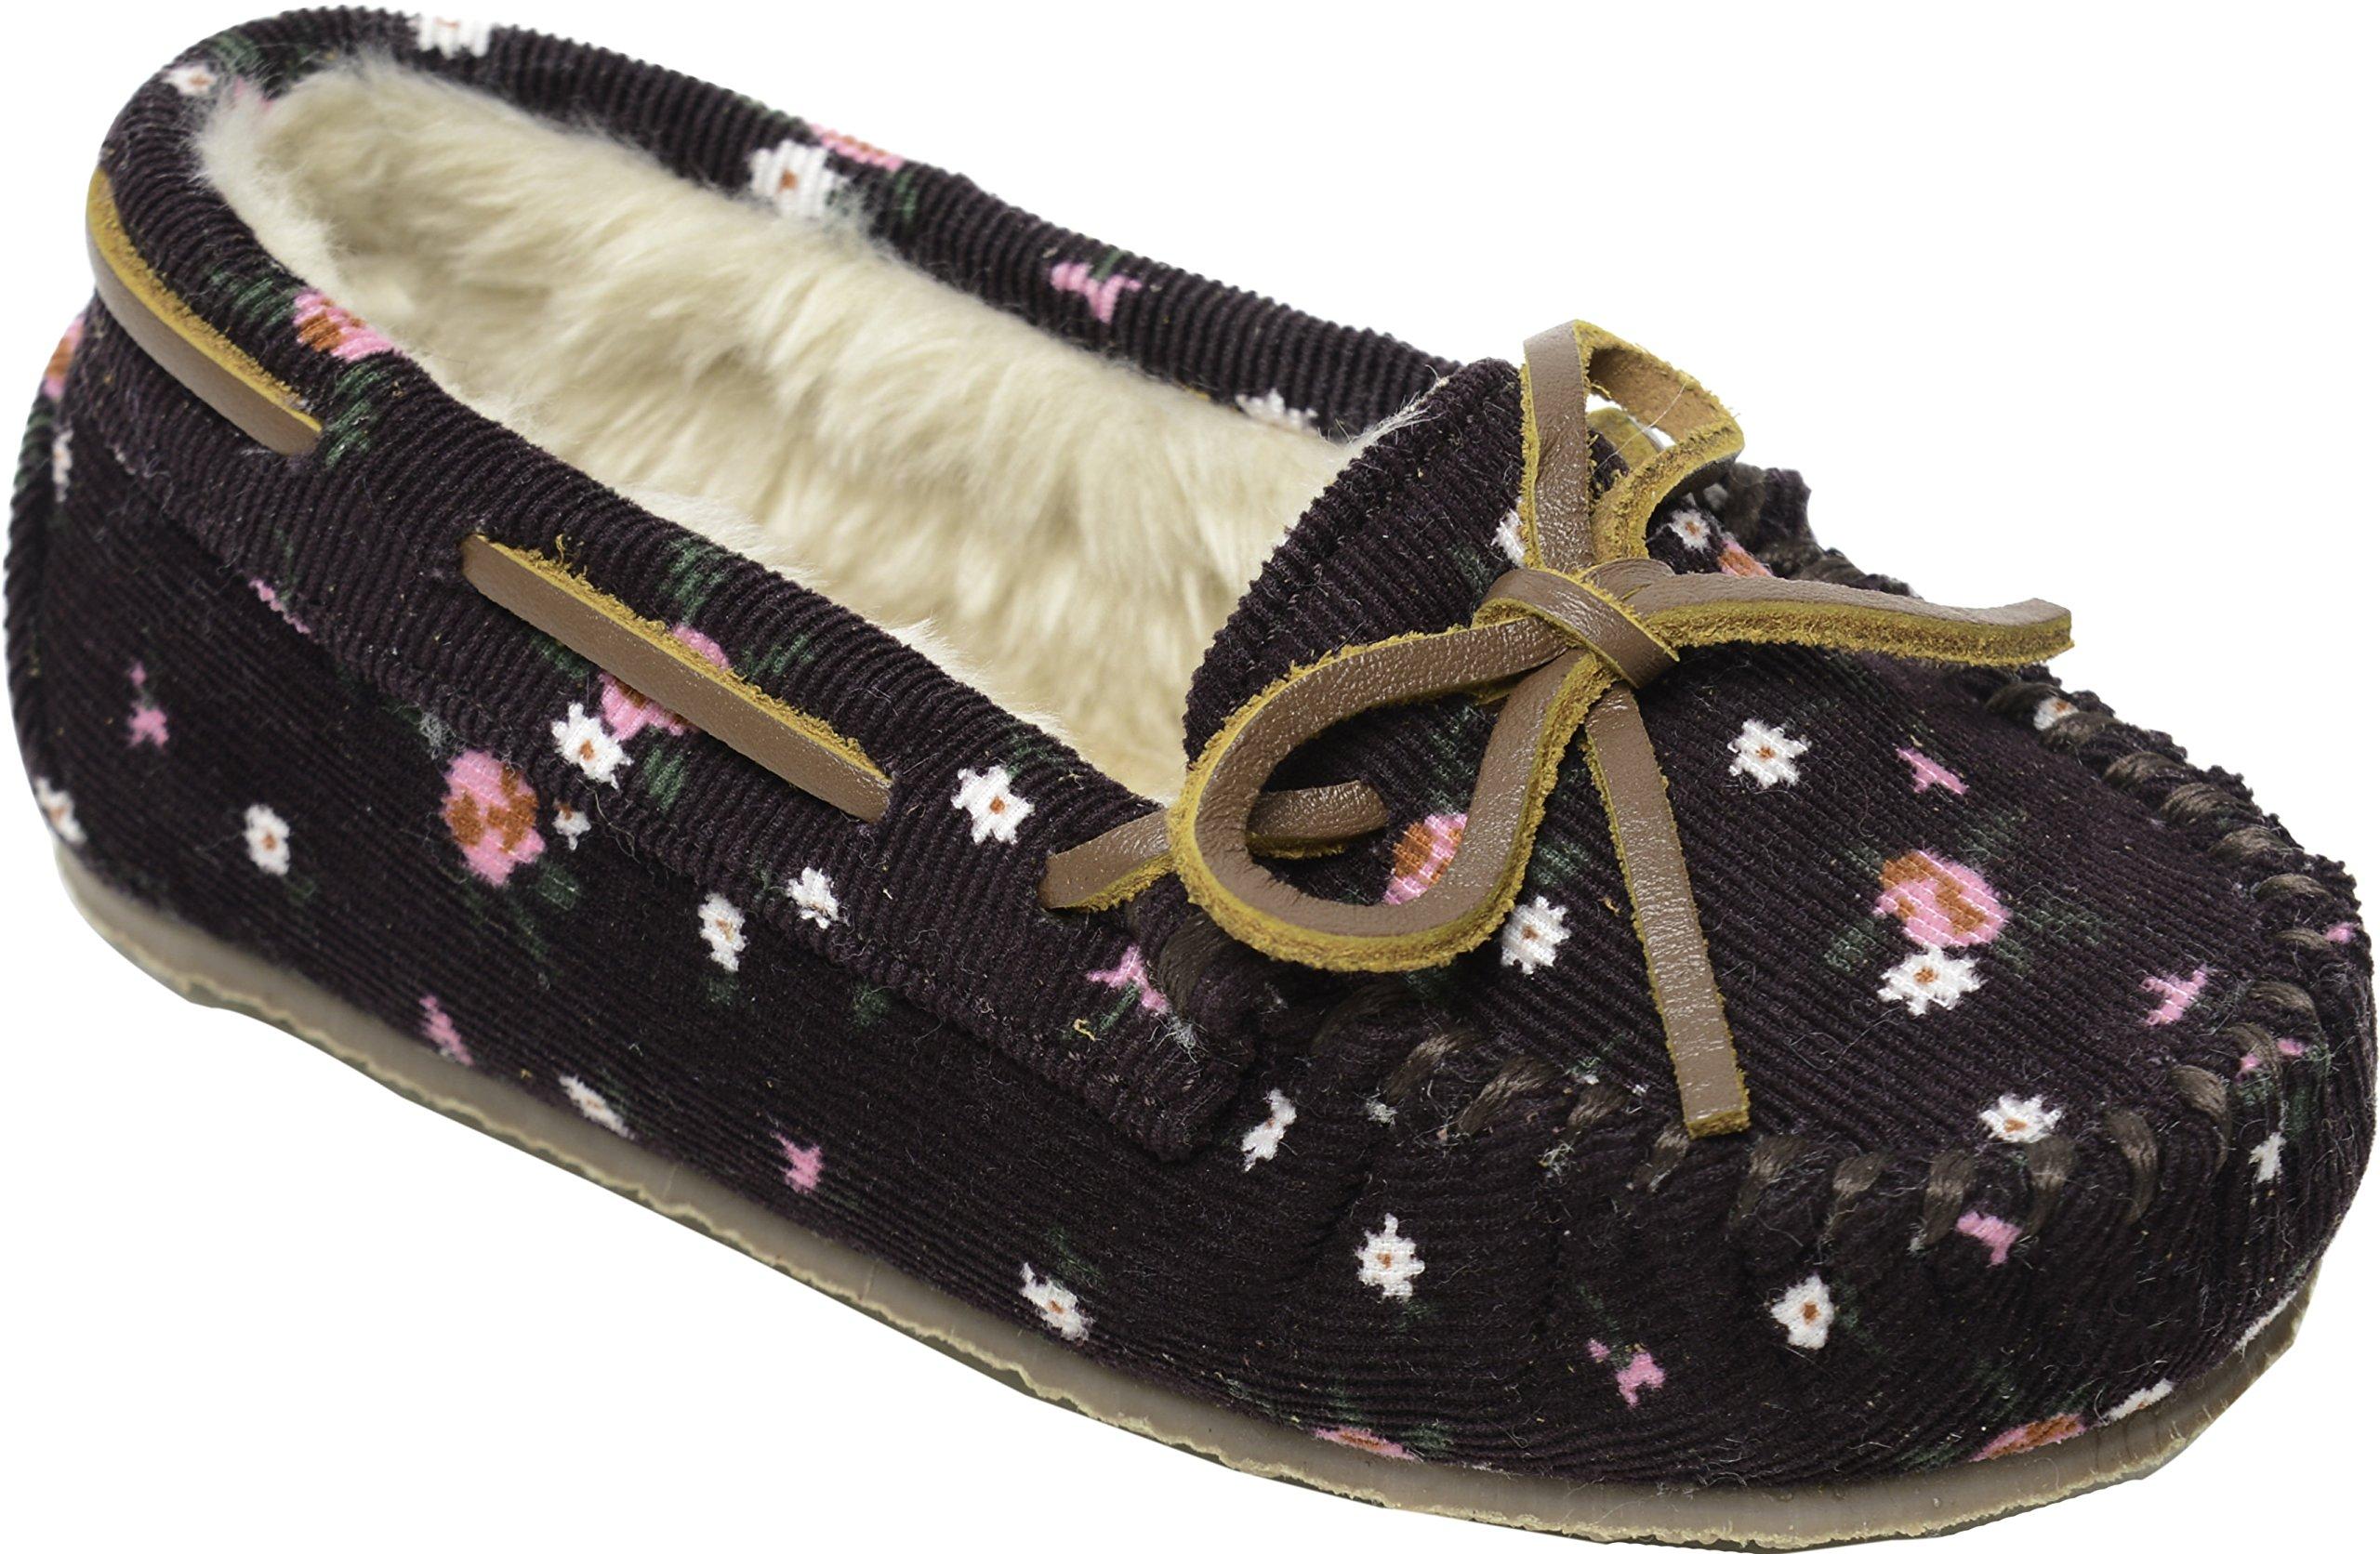 Minnetonka Girls Floral Corduroy Cassie Slipper, Raisin Floral, Size 1 M US Little Kid